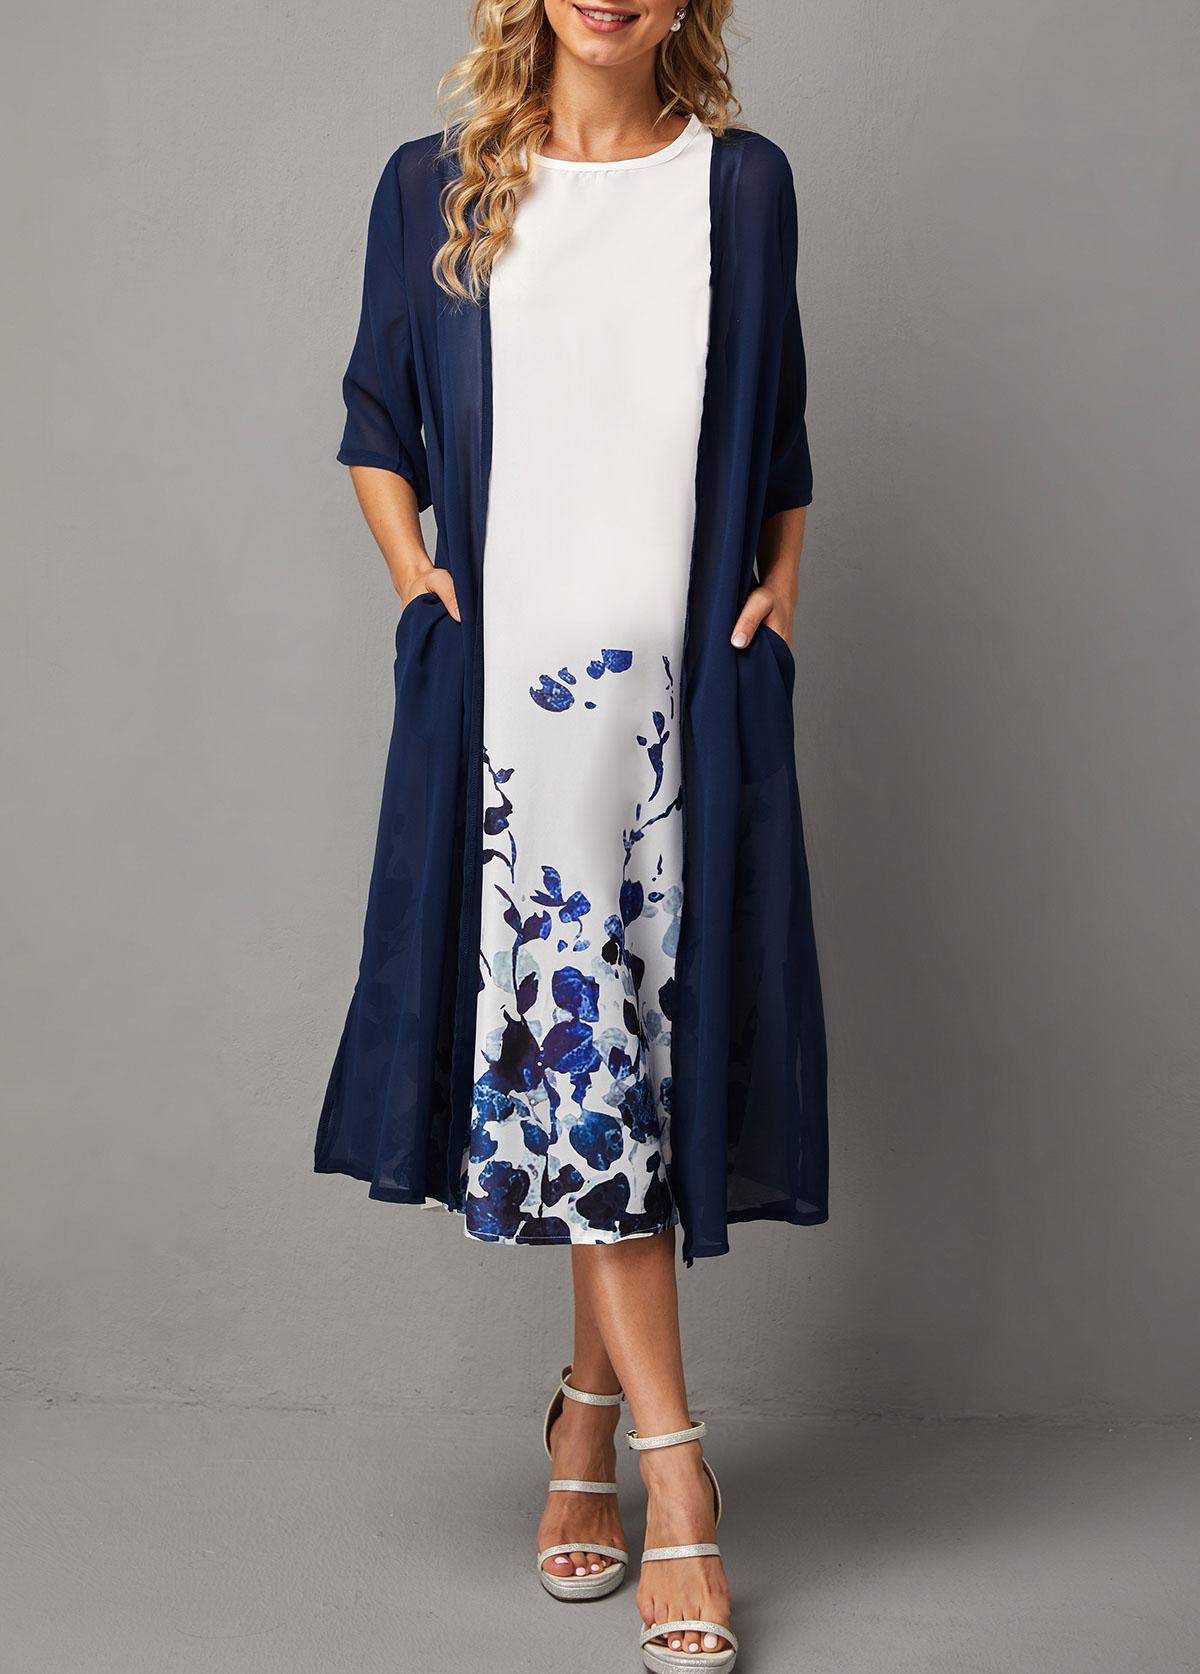 Chiffon Solid Cardigan and Sleeveless Floral Print Dress